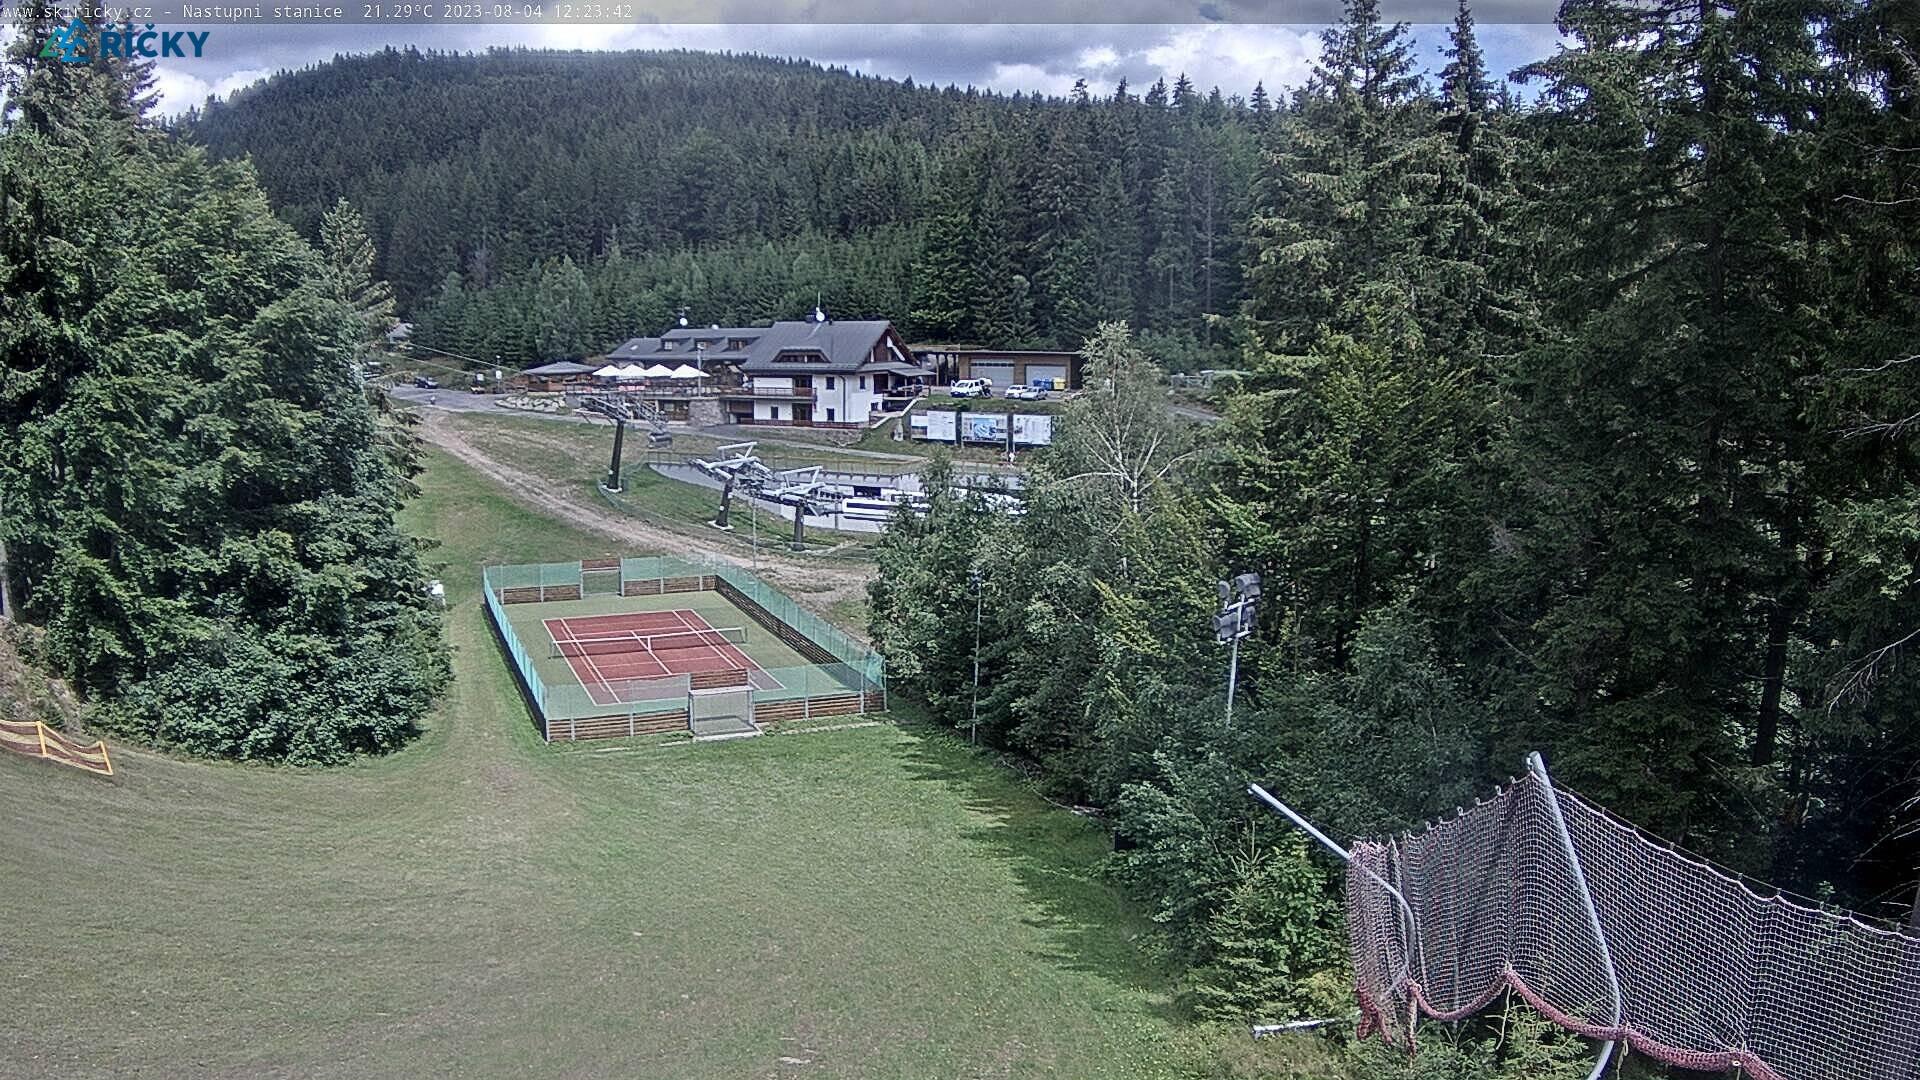 Webcam Skigebiet Ricky v O.h. cam 2 - Adlergebirge